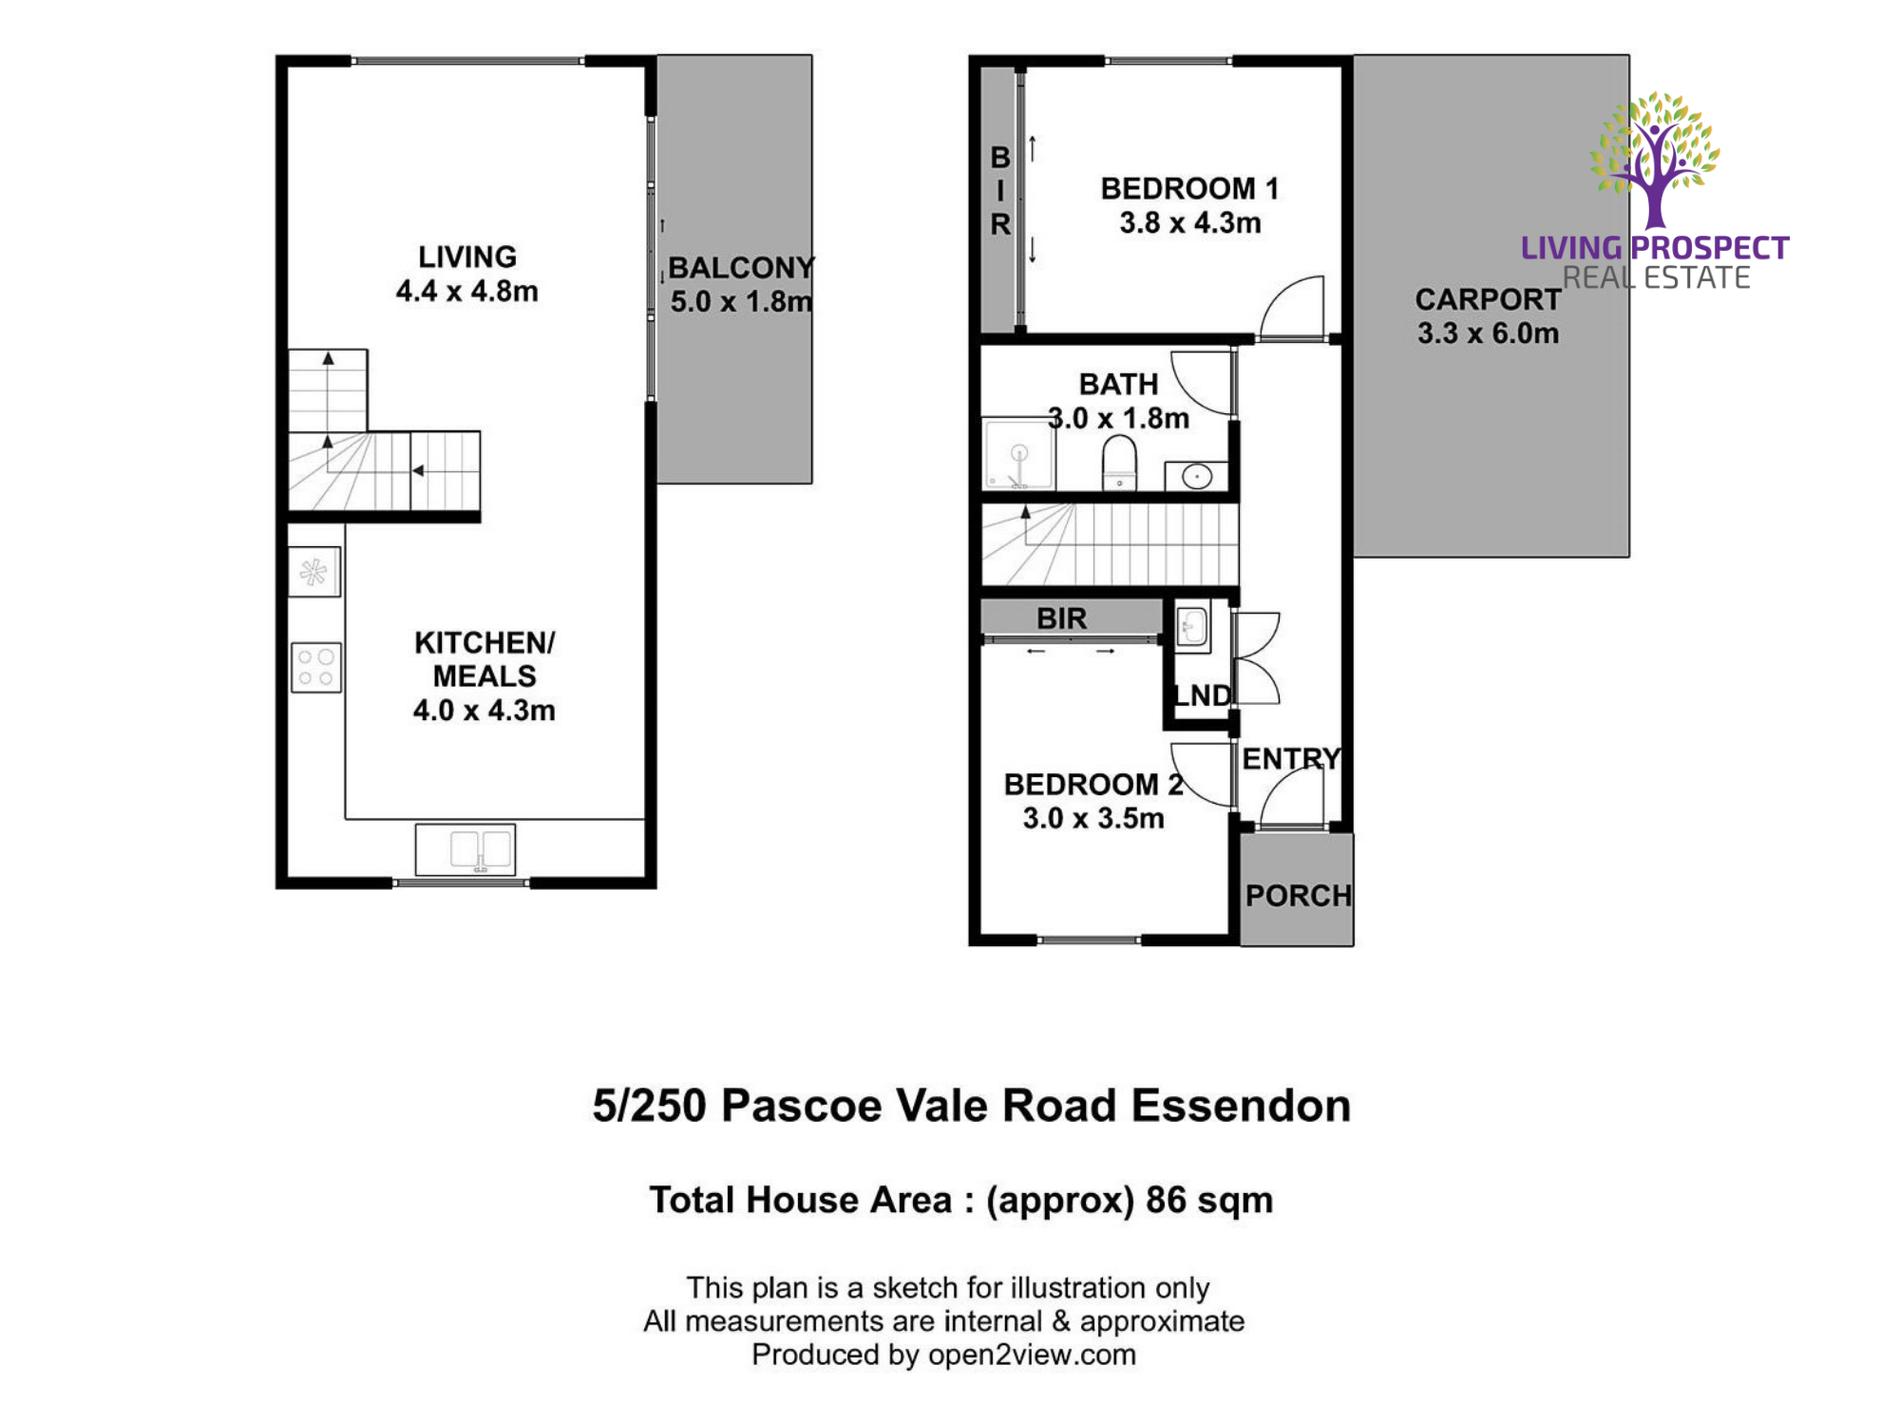 5 / 250 Pascoe Vale Road, Essendon